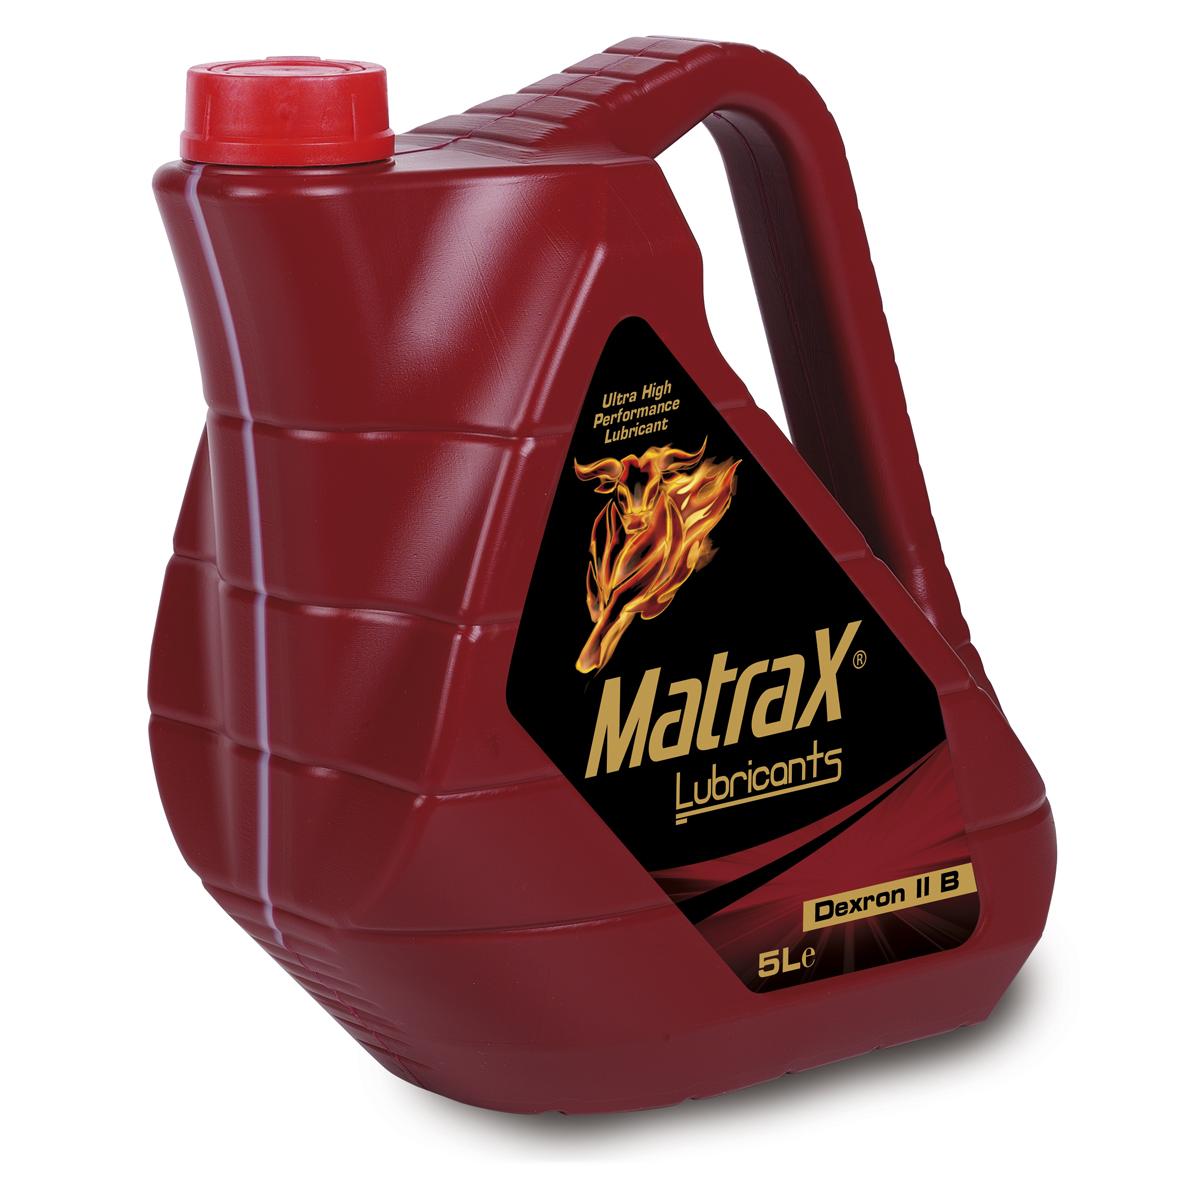 MatraX Dexron II B